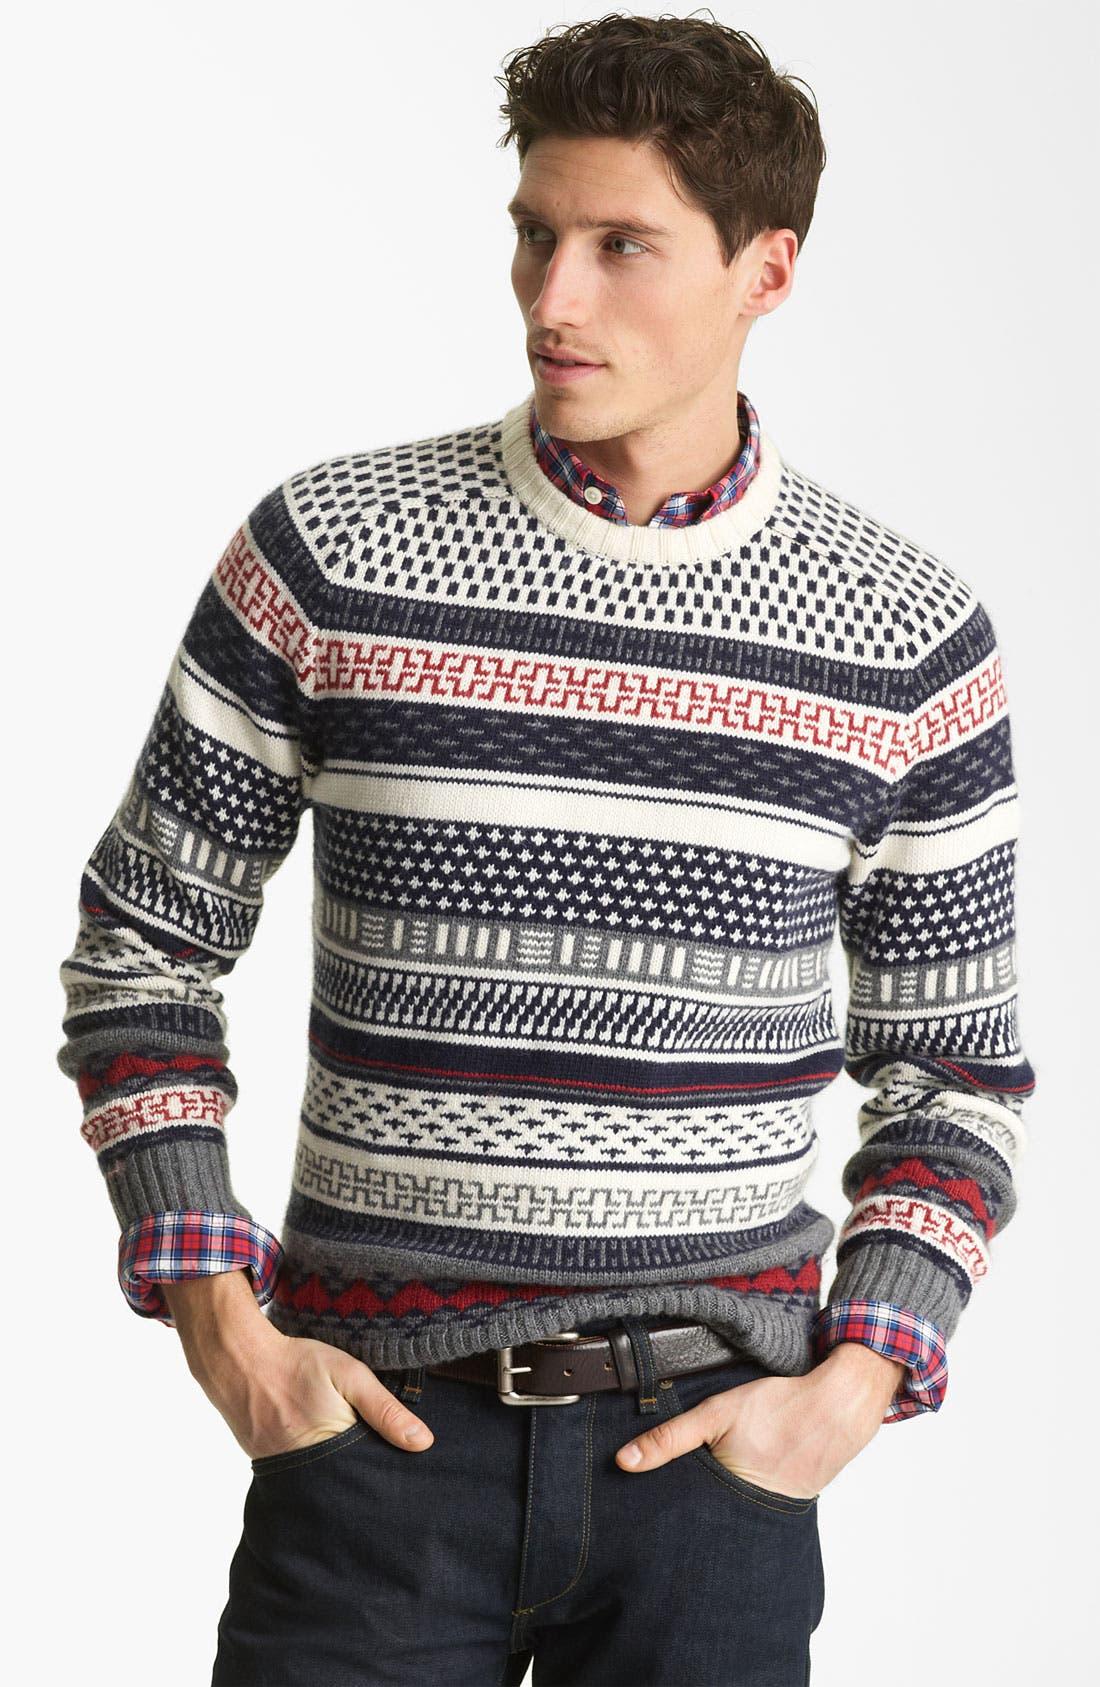 Alternate Image 1 Selected - Jack Spade 'Stone' Fair Isle Crewneck Sweater